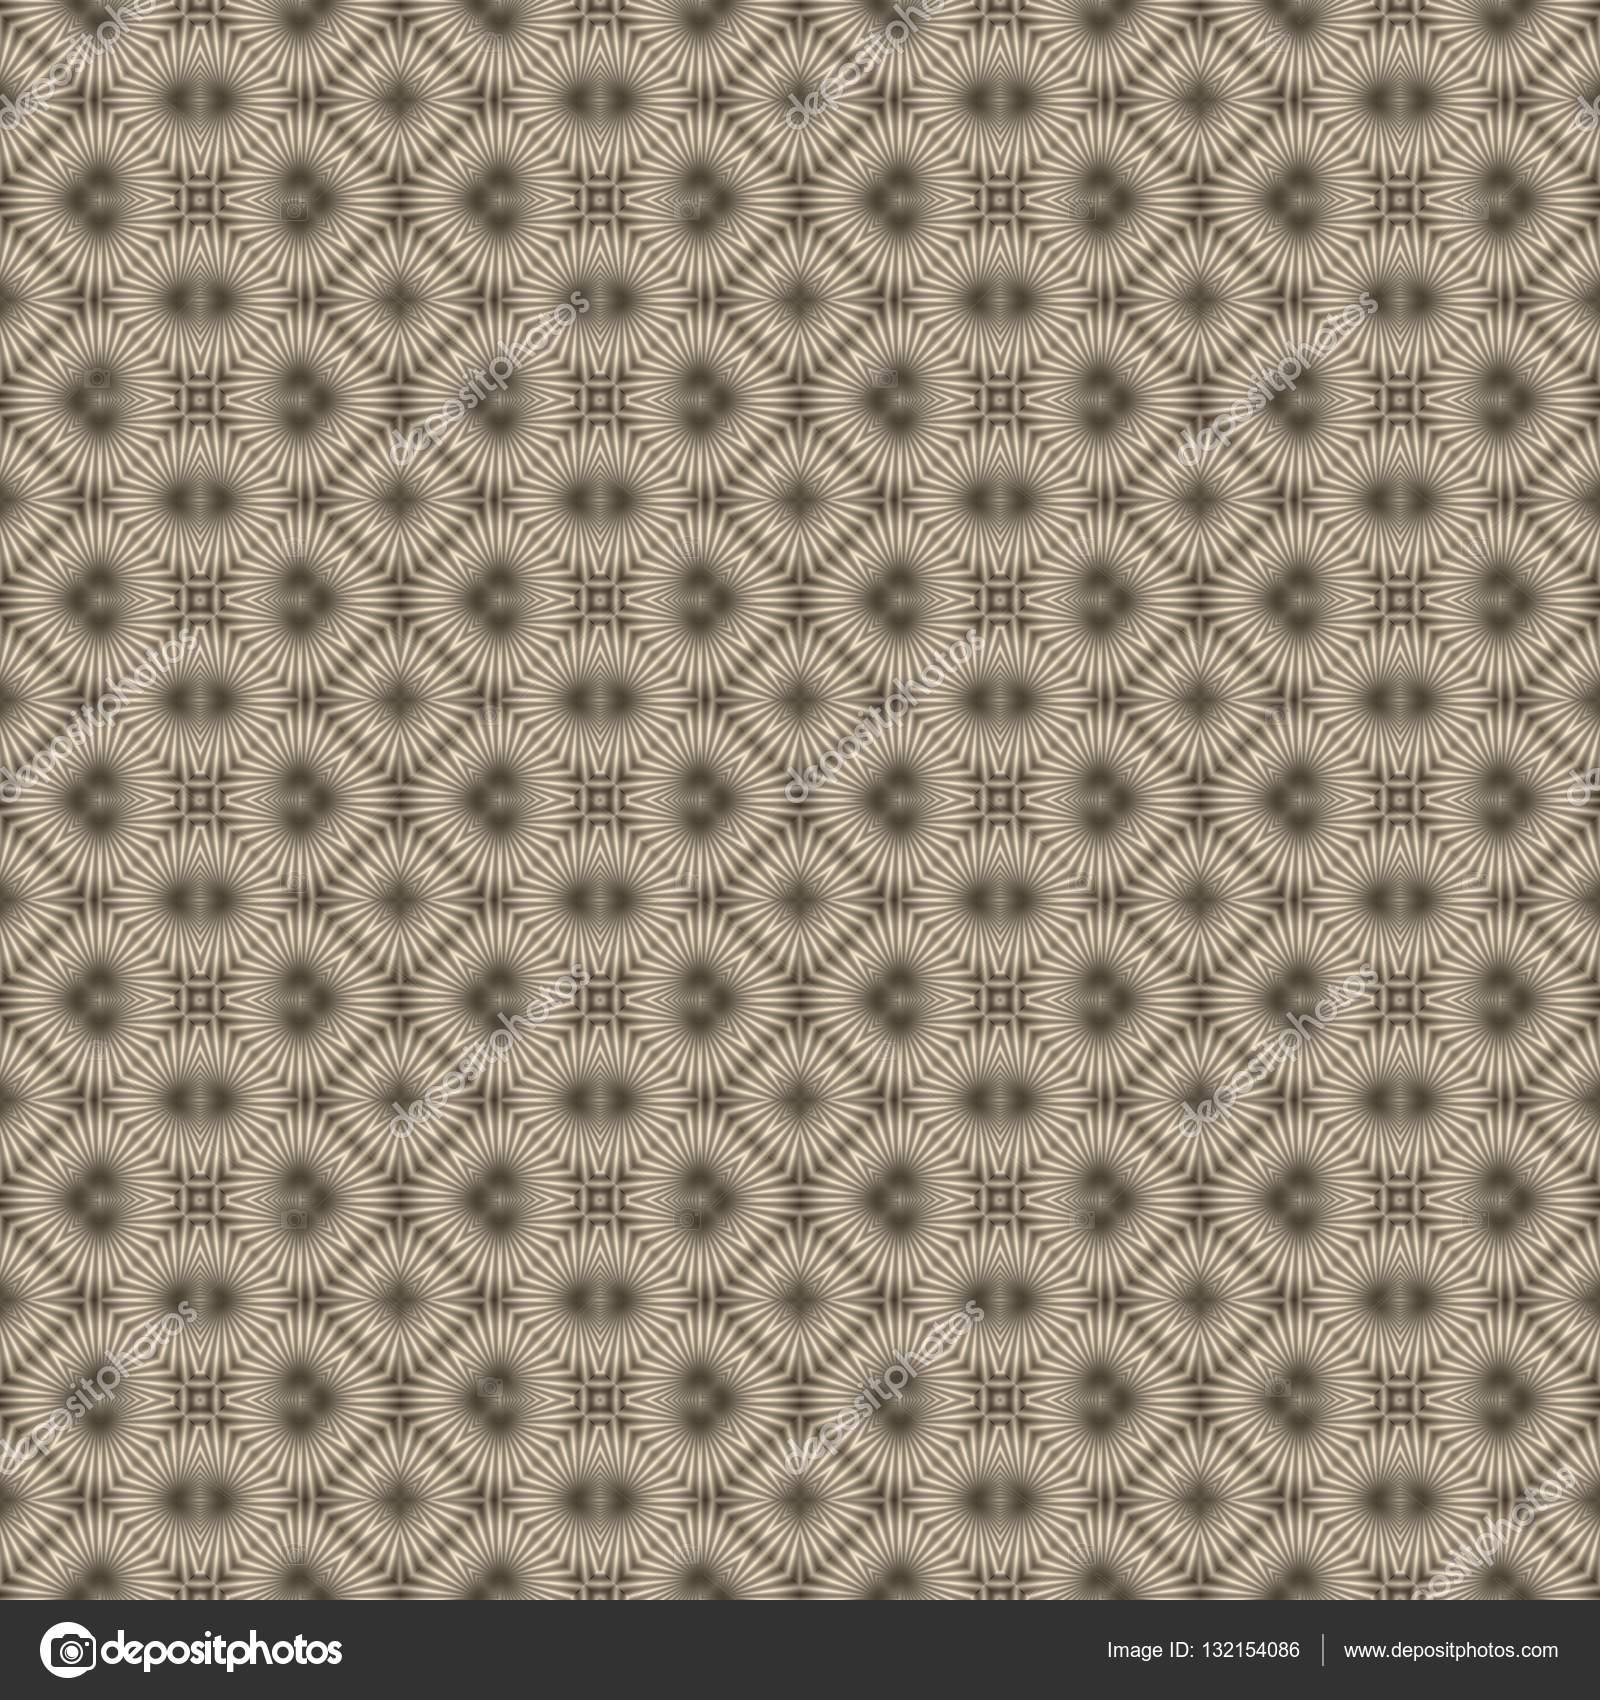 Nahtlose Beige Art-deco-Design Muster Tapete — Stockfoto © sangriana ...